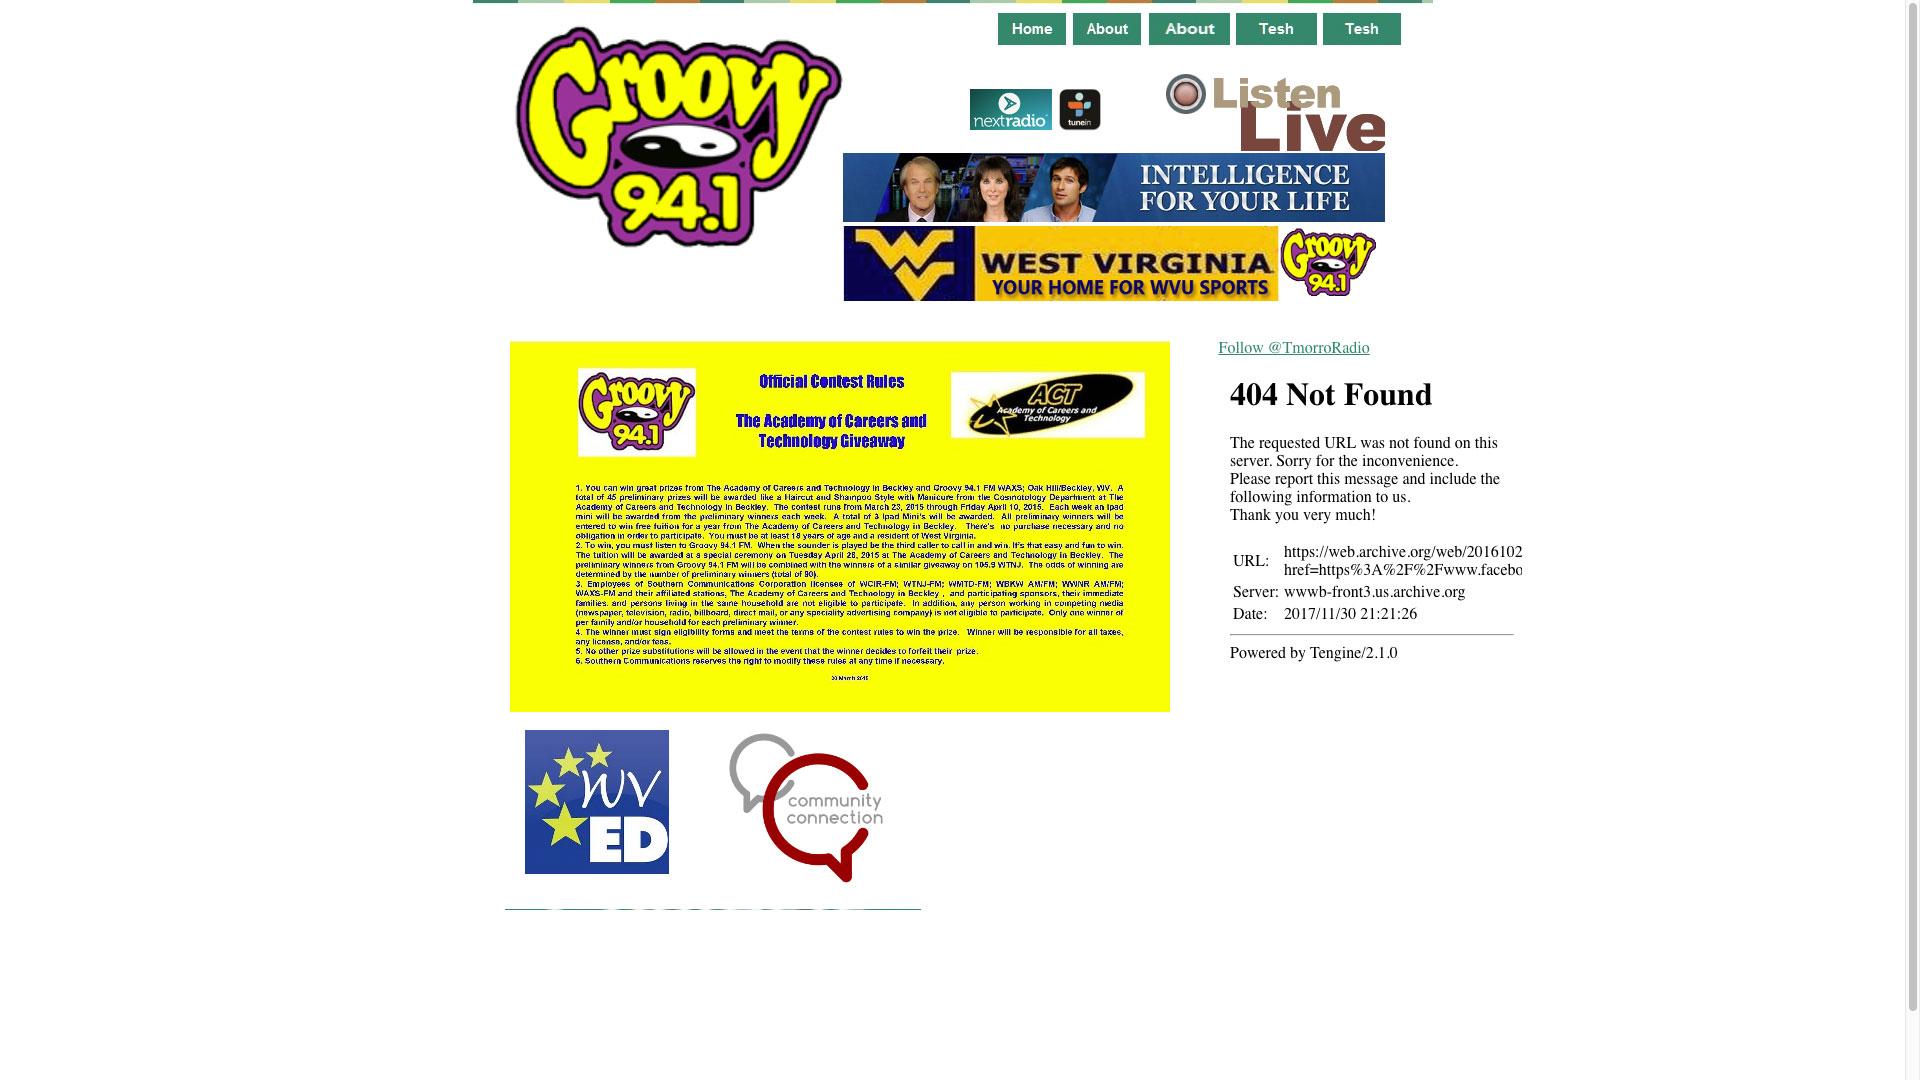 groovy-contest-dates-web-design